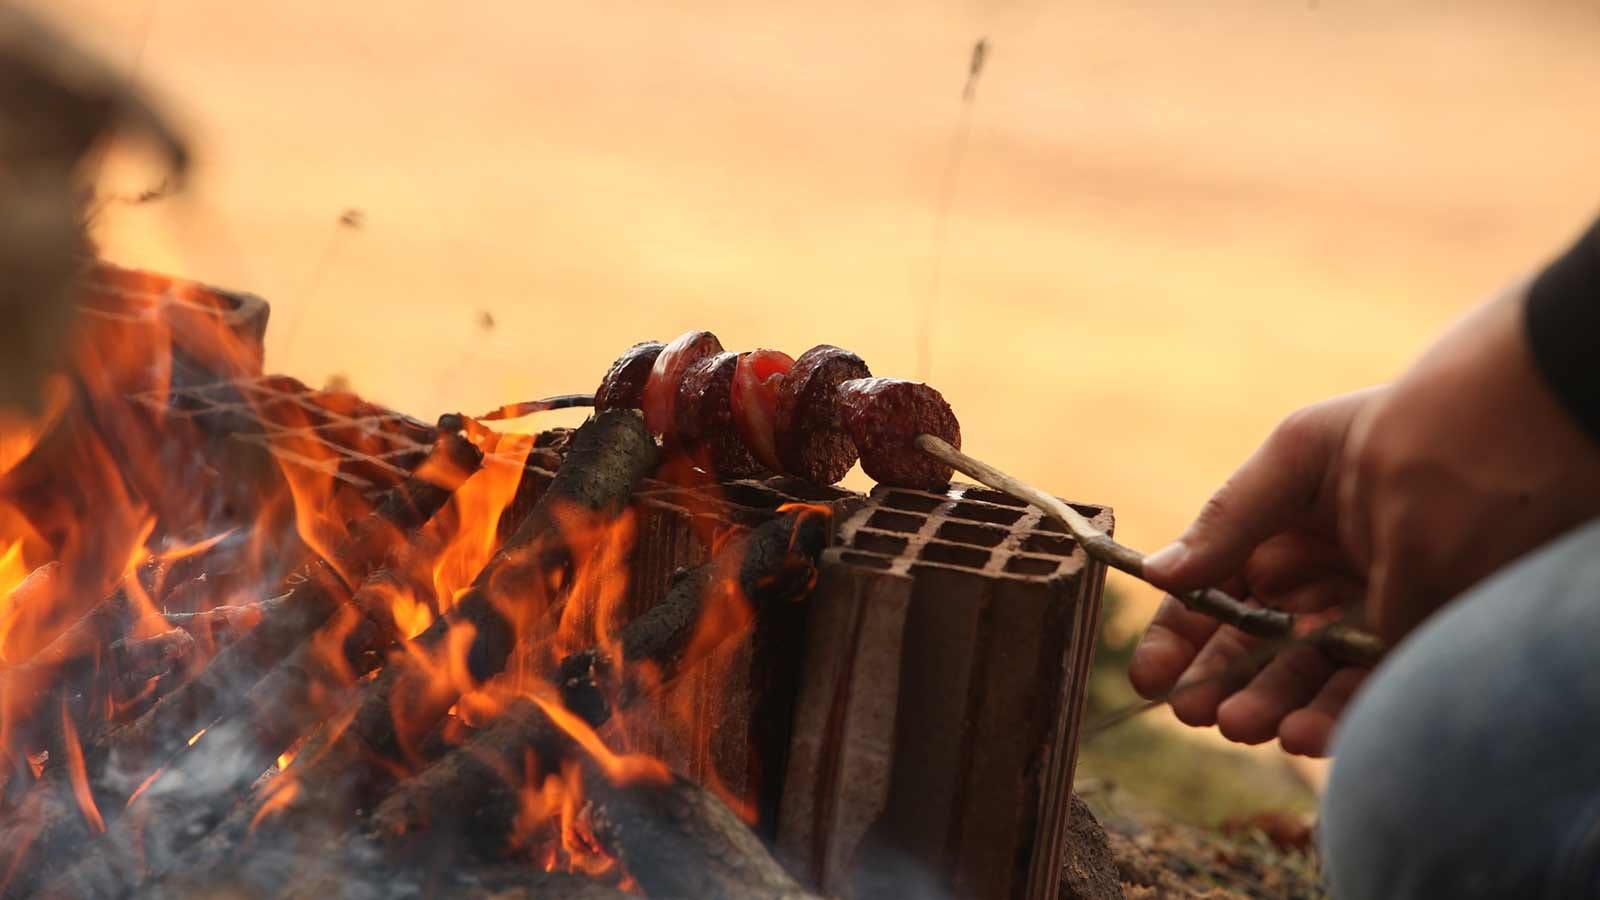 Roasting veggies over an open fire on a skewer.